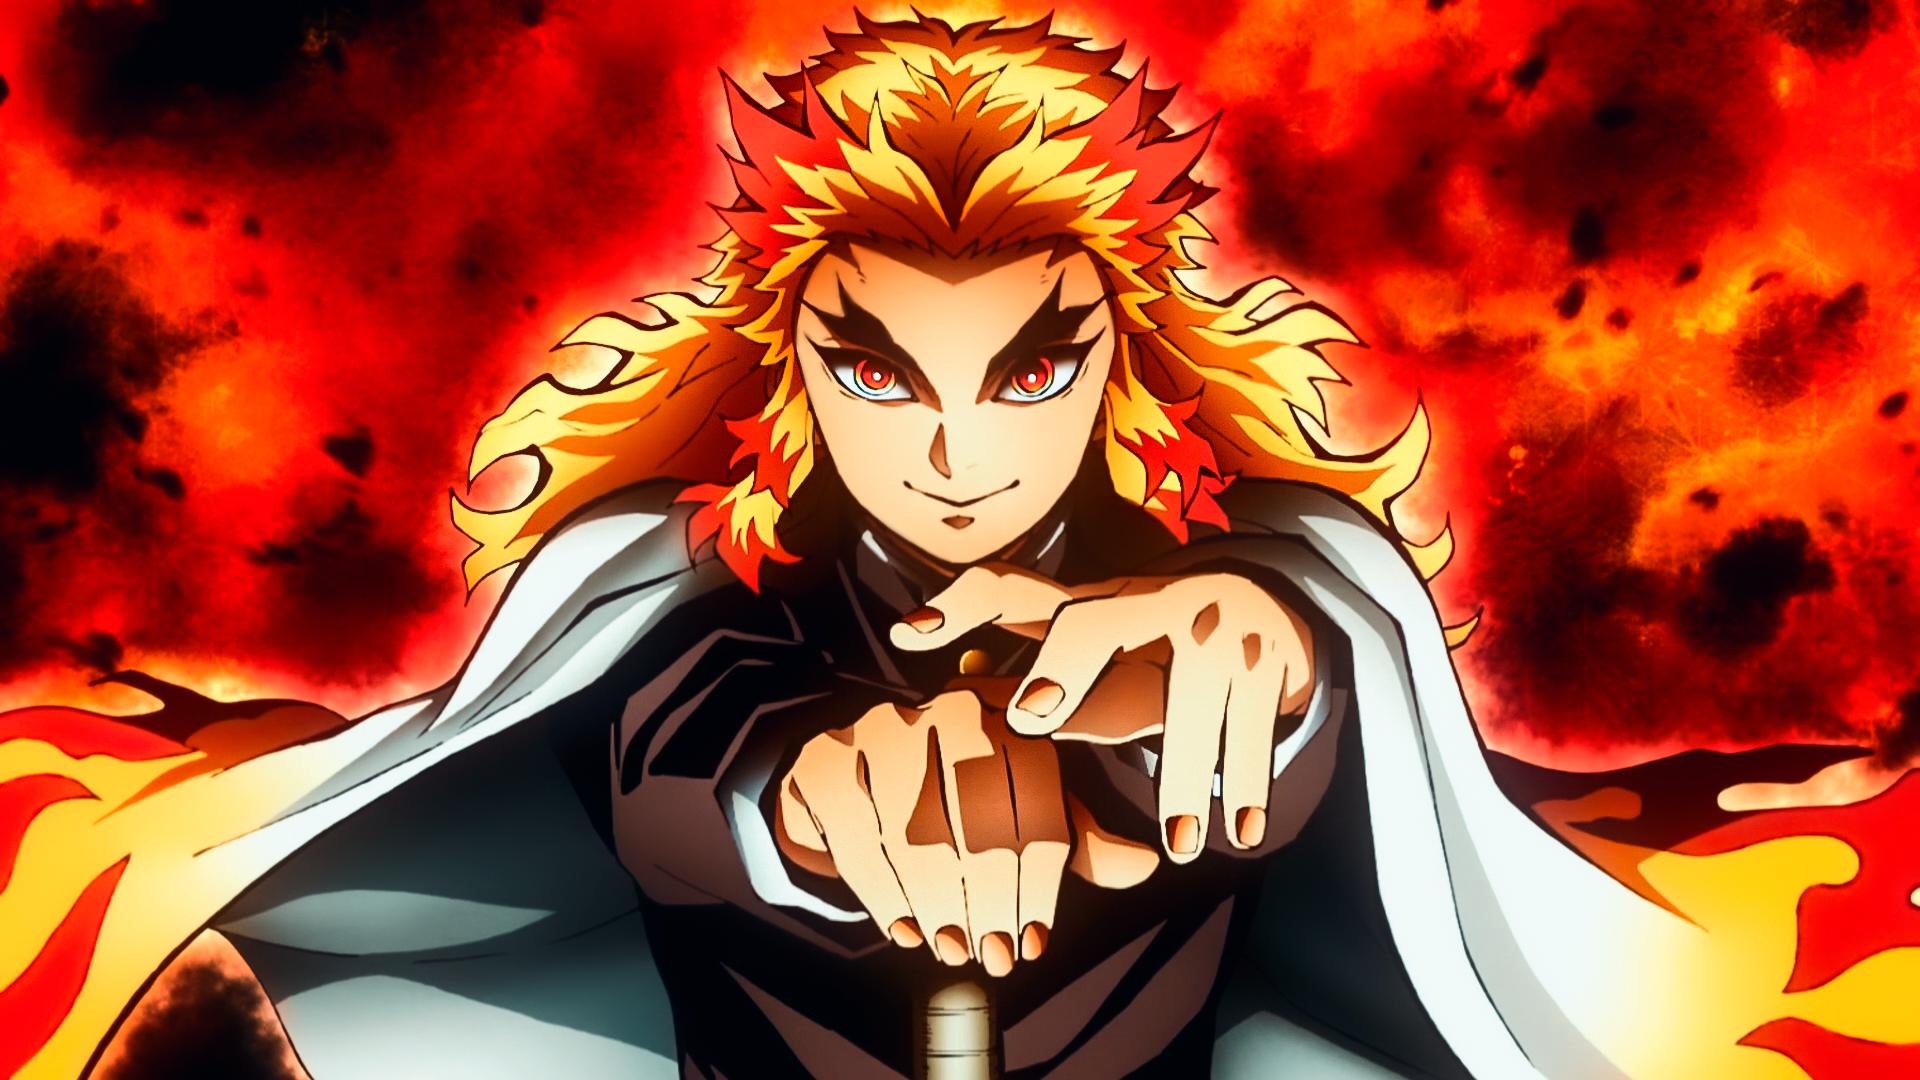 Demon Slayer: Kimetsu no Yaiba Fondo de pantalla HD | Fondo de Escritorio | 1920x1080 | ID ...